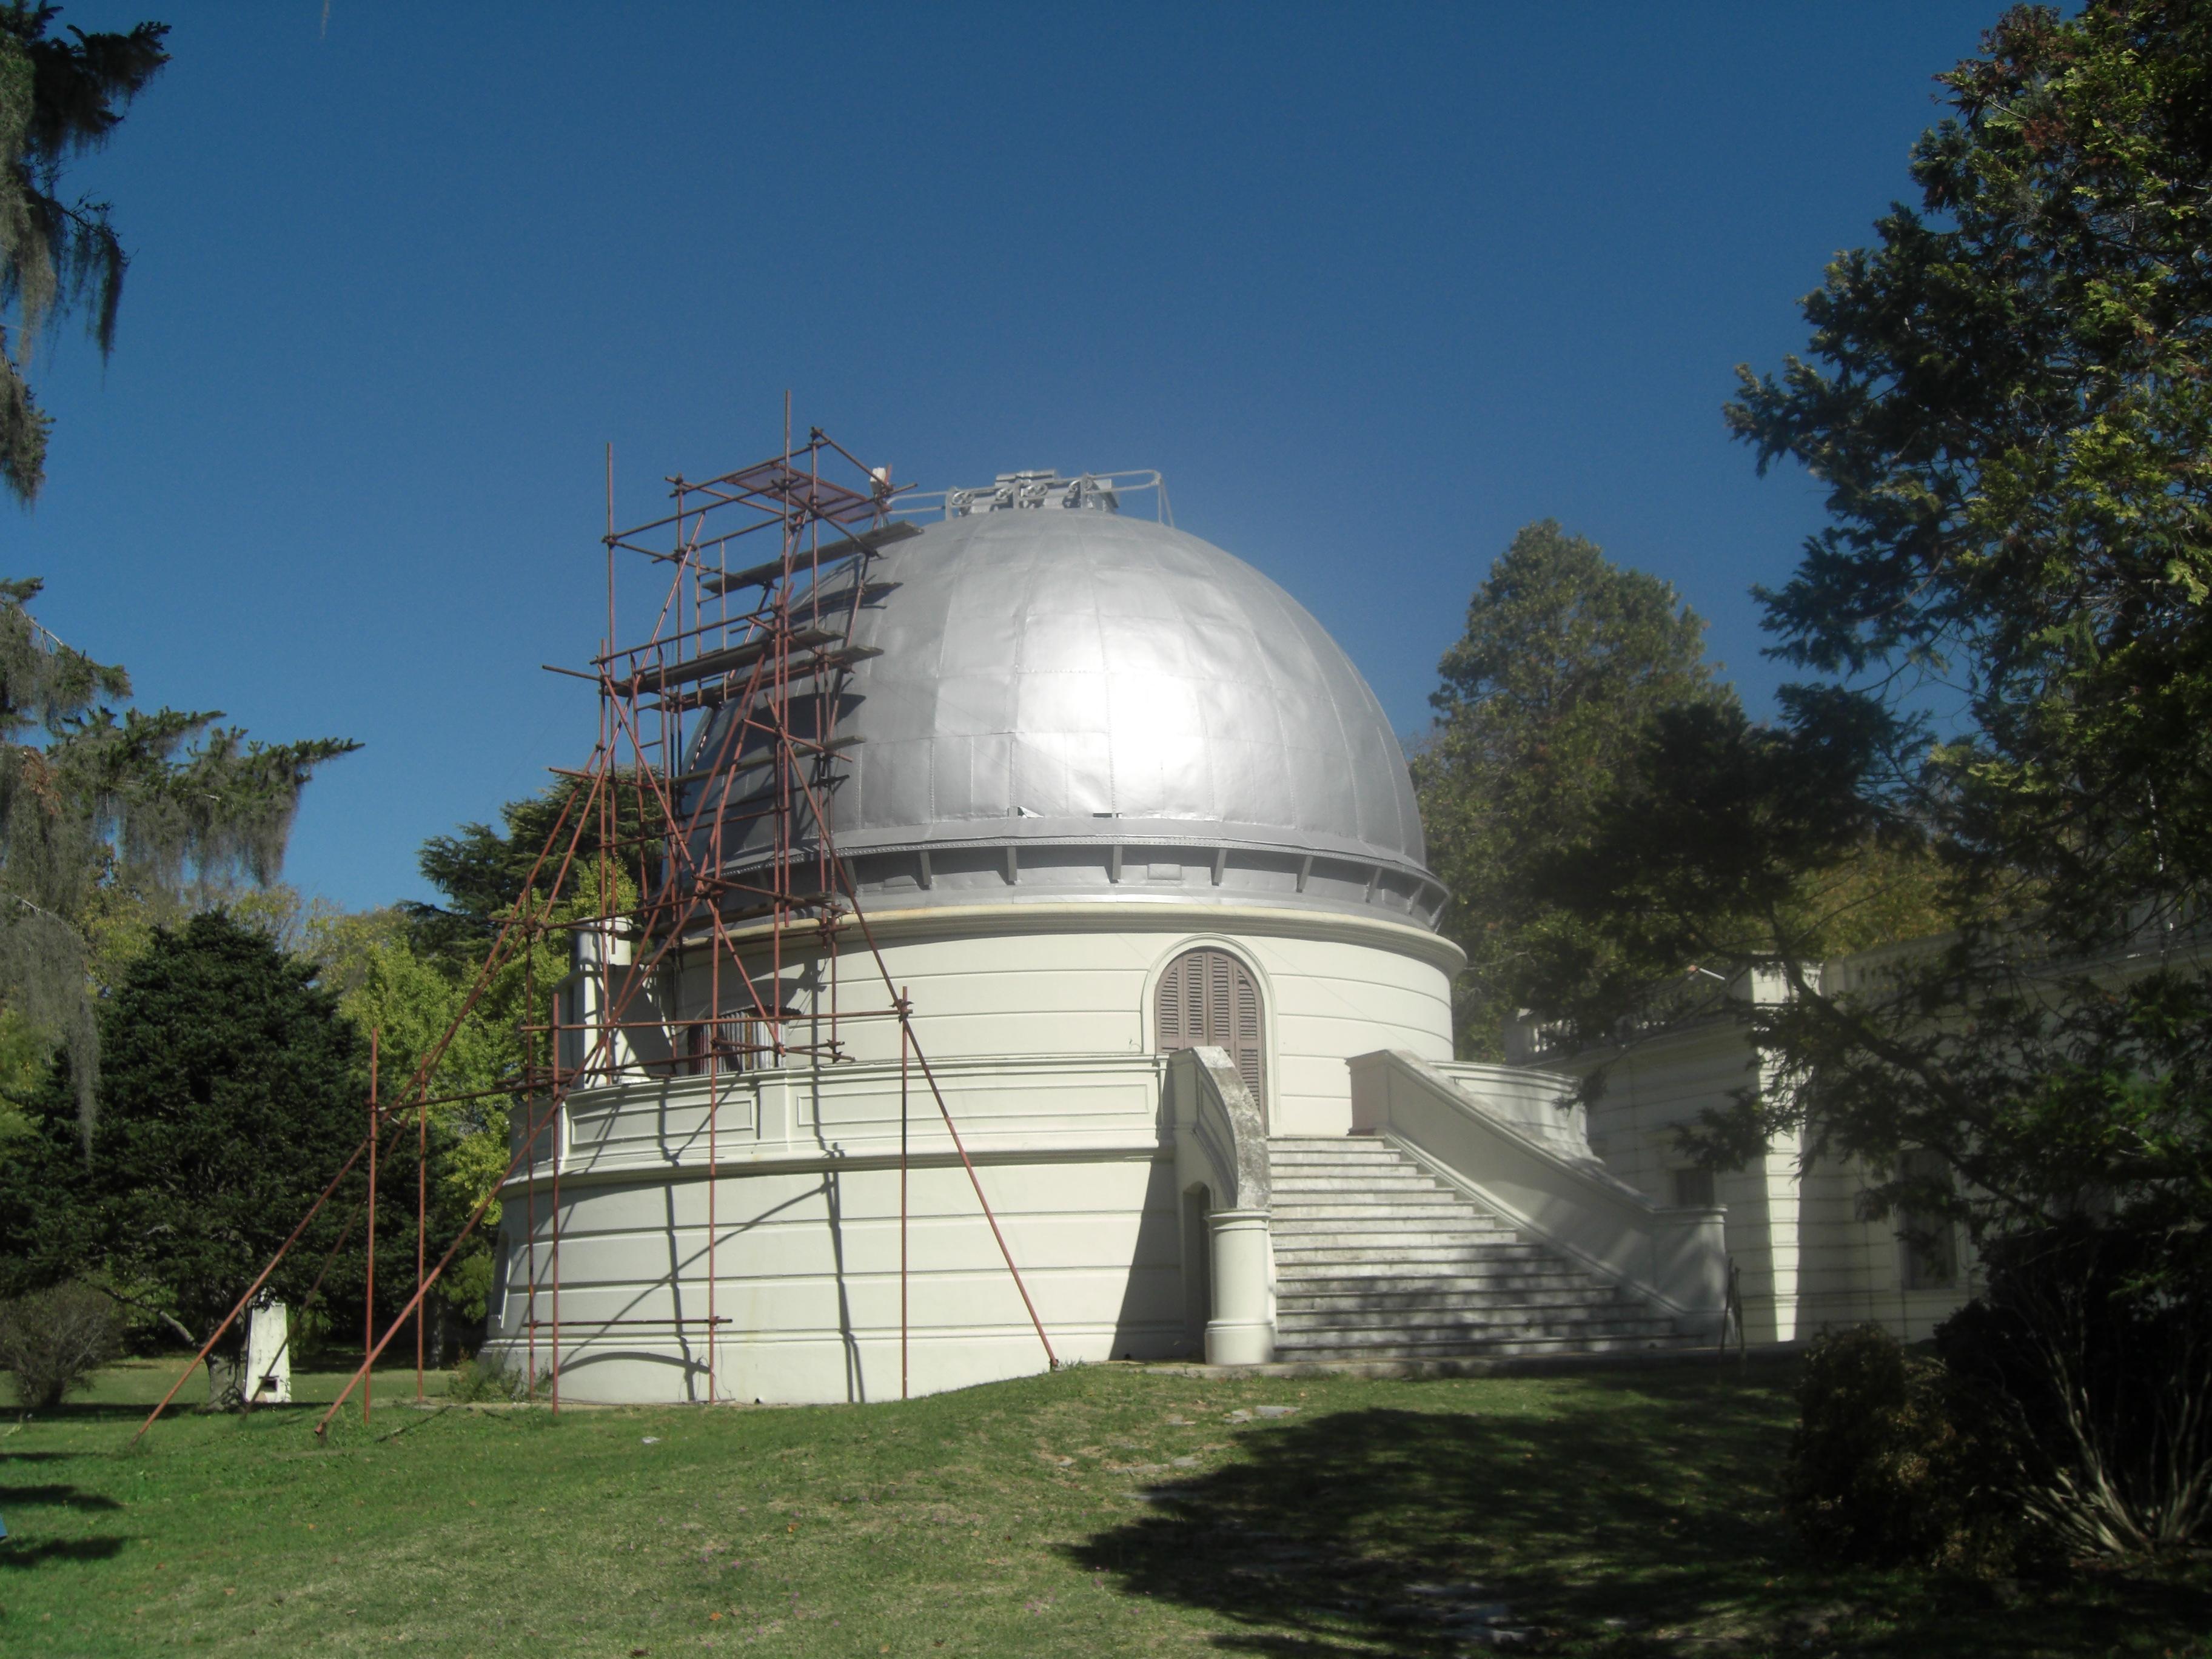 Telescopio_UNLP_001.JPG